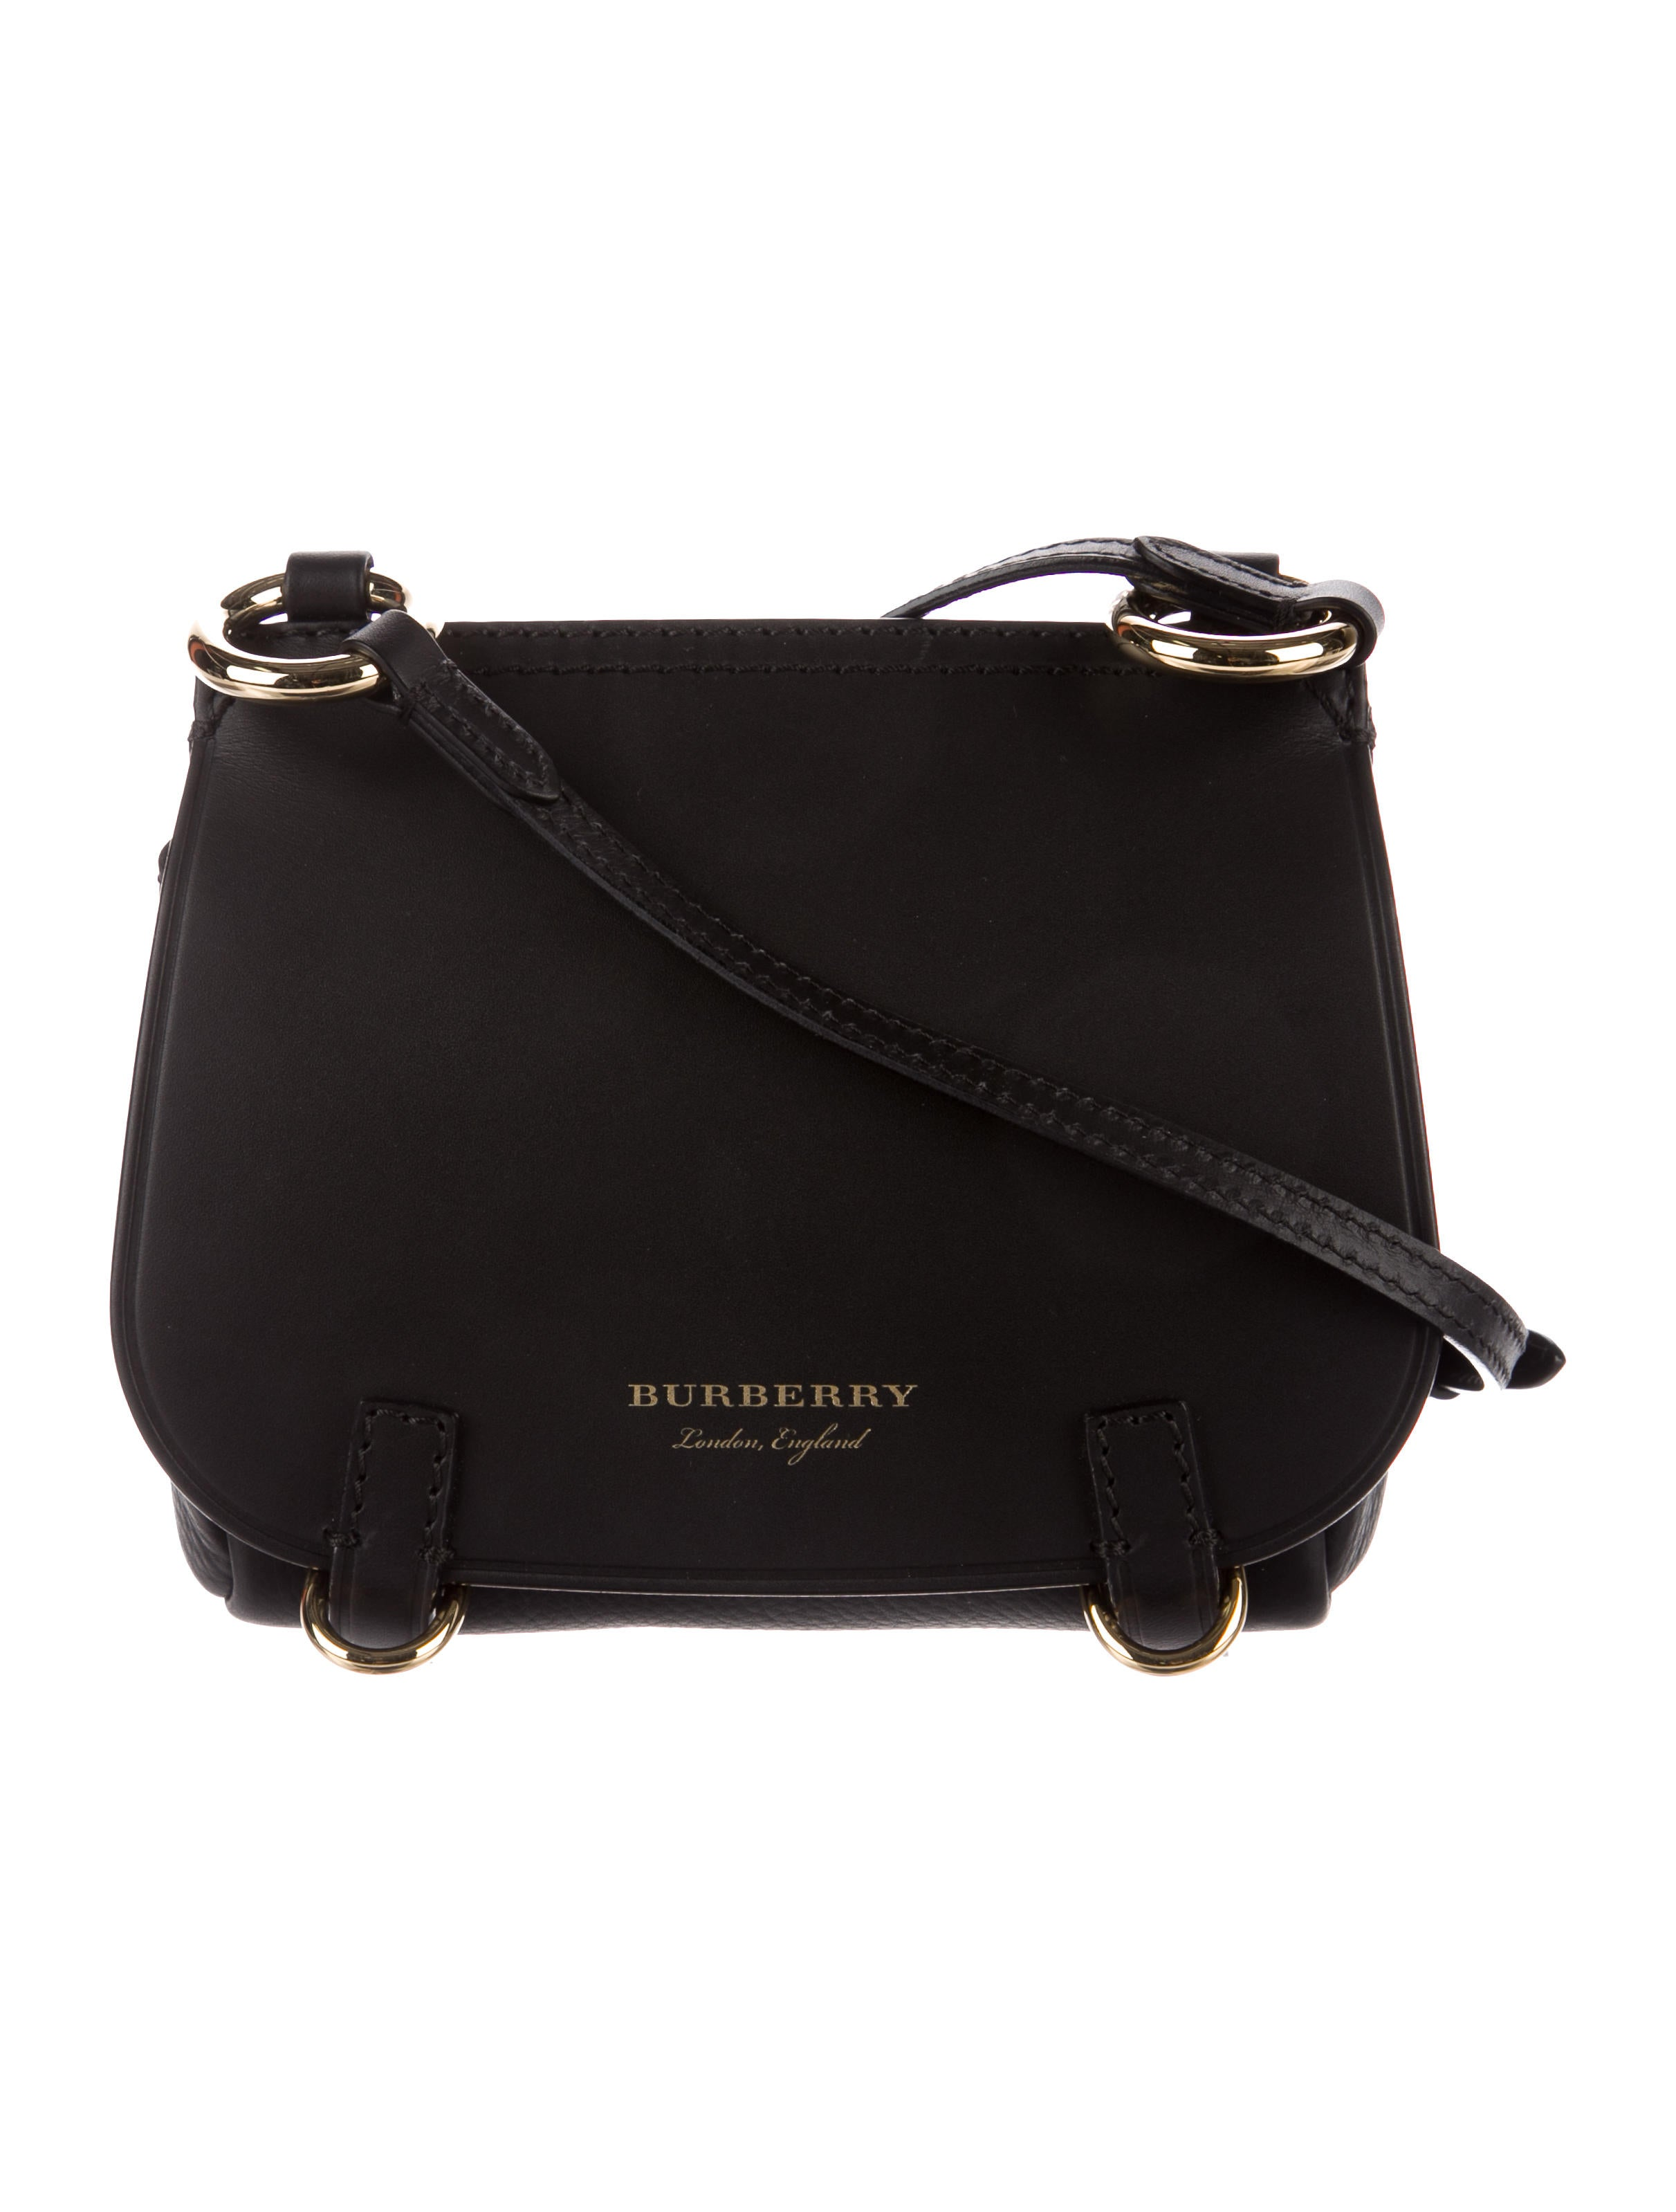 Burberry Baby Bridle Leather Crossbody Bag - Handbags - BUR84639 ... a59321b4cddac